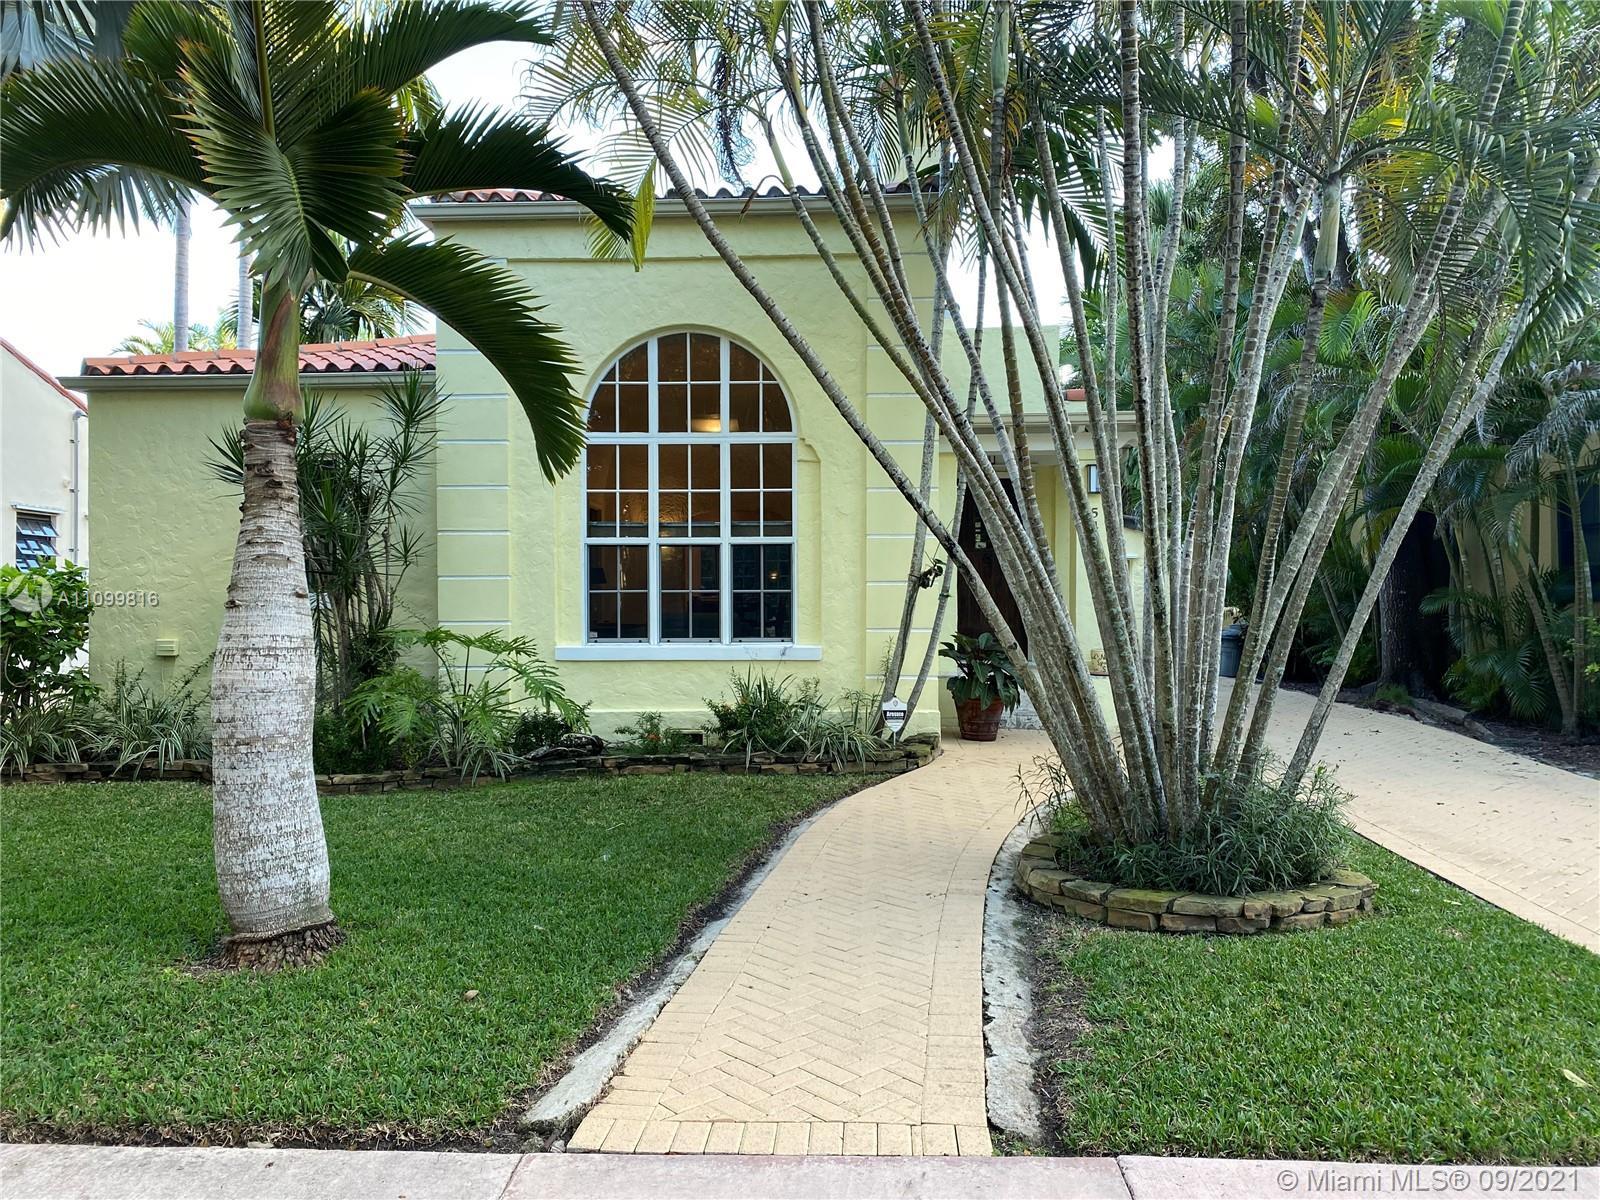 Single Family Home,For Rent,544 San Lorenzo Ave, Coral Gables, Florida 33146,Brickell,realty,broker,condos near me